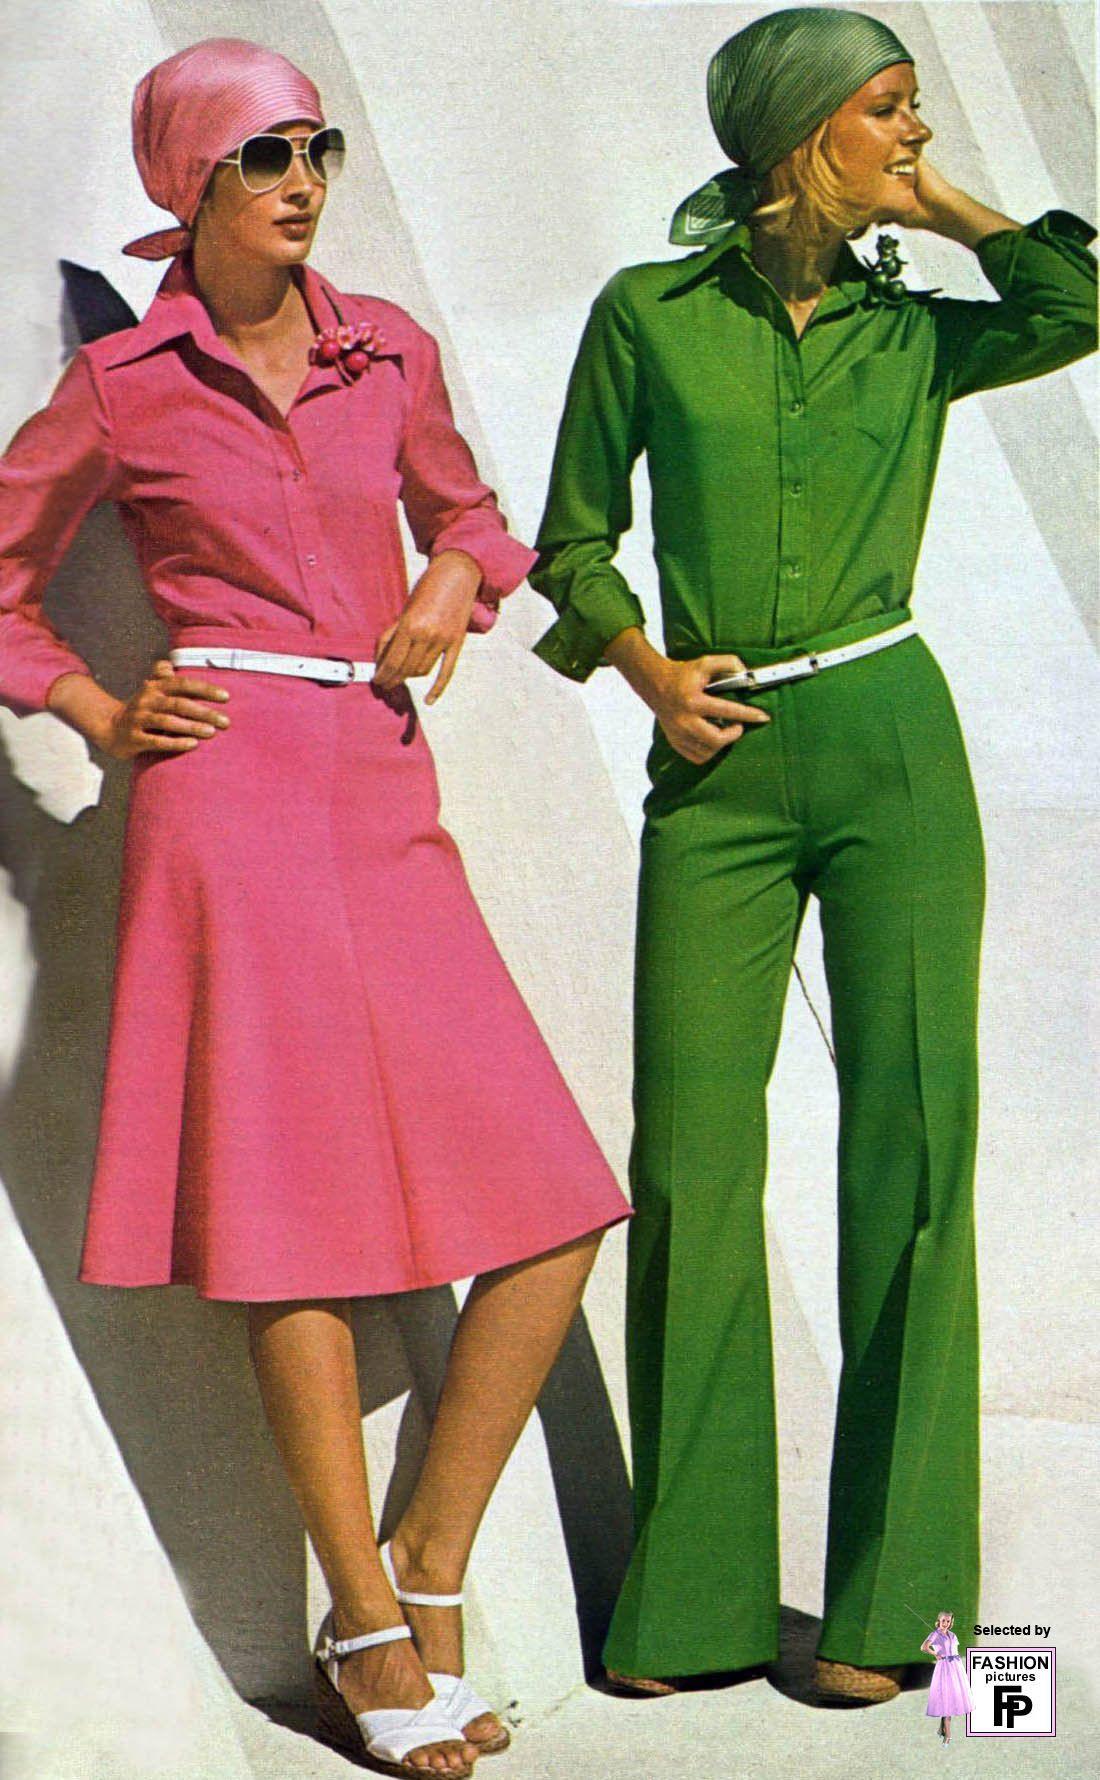 Fashion of 1970s - 1970s Vintage Clothing 1975 1 Ne 0013 Jpg